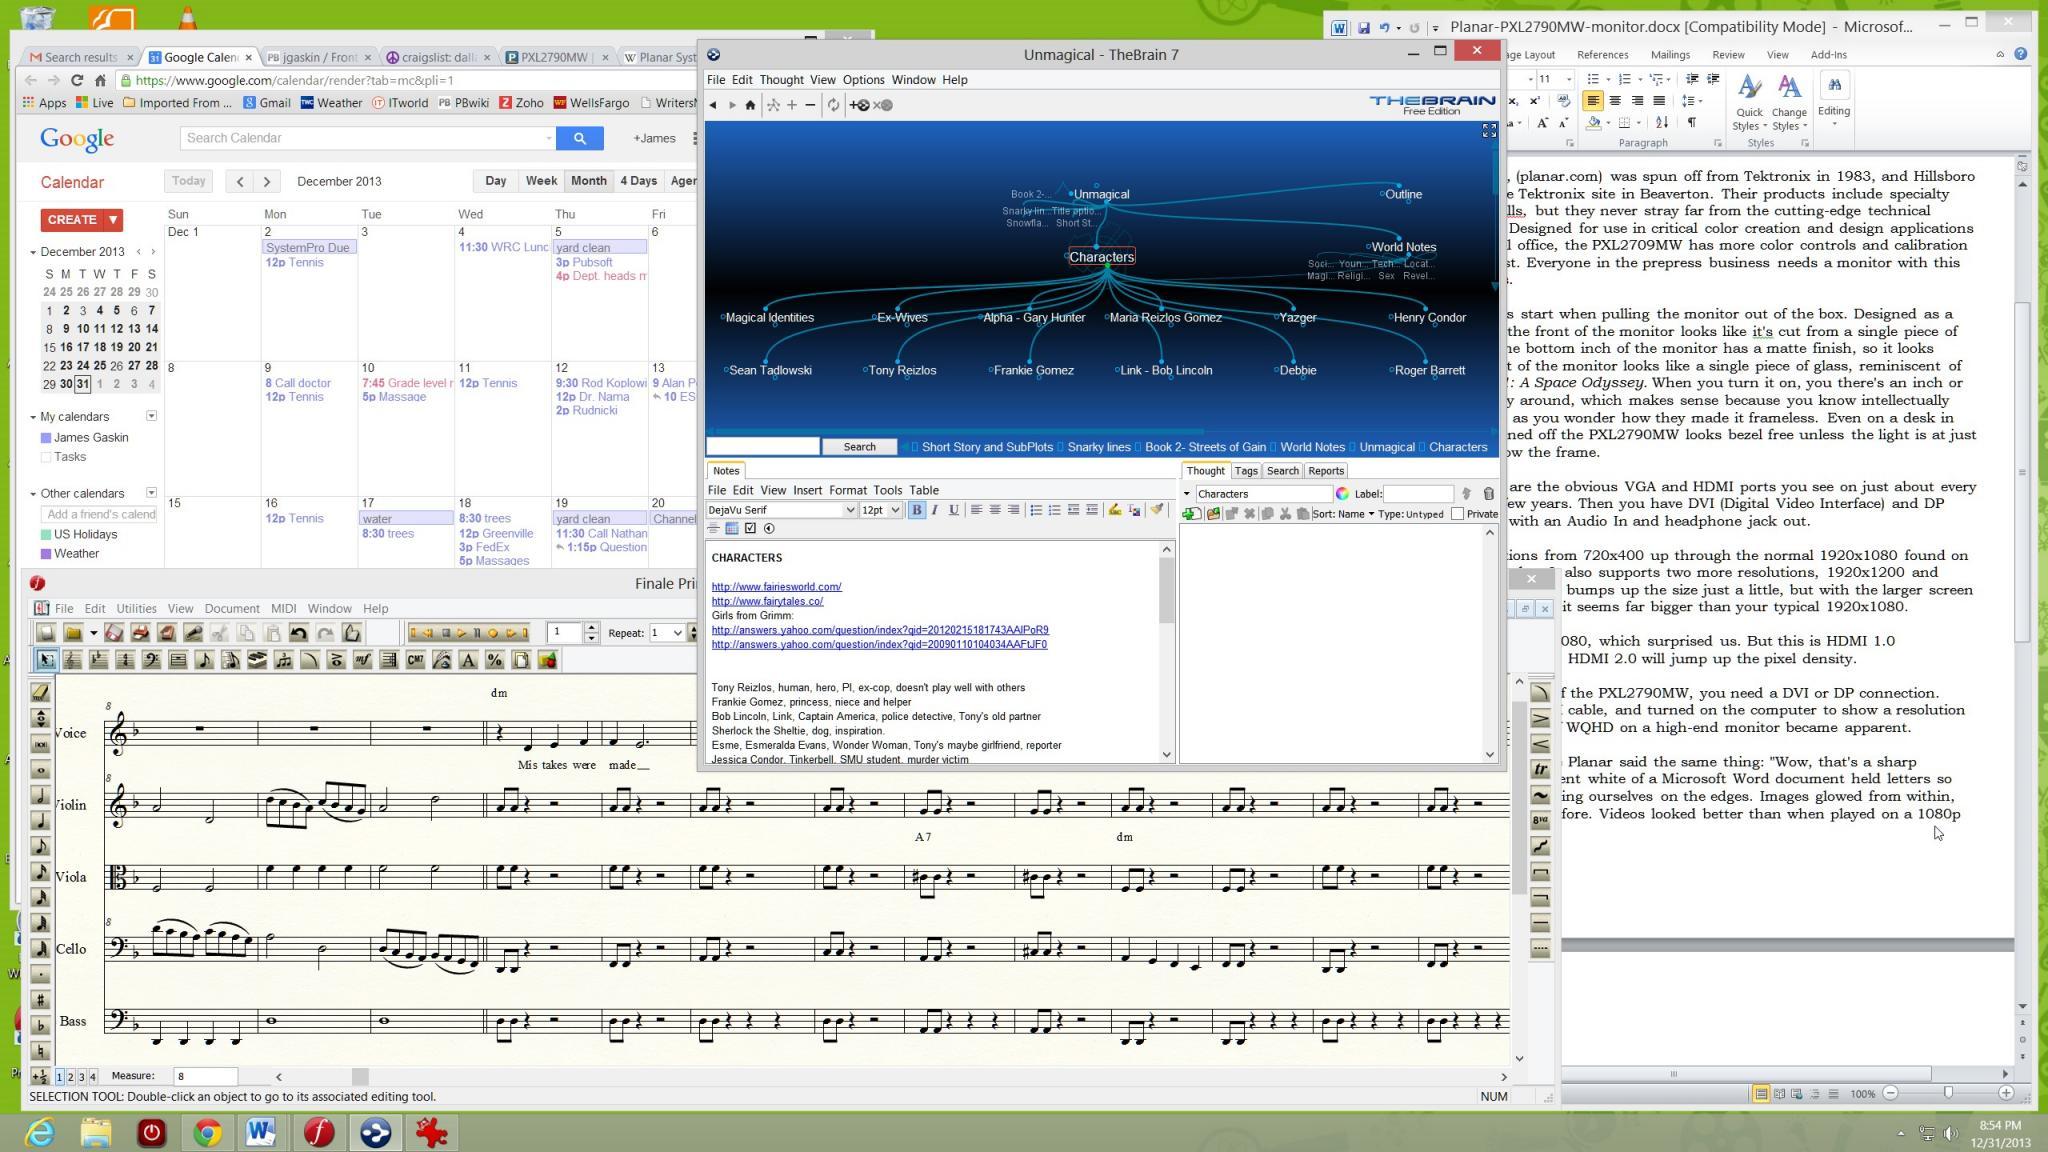 Planar PXL2790MW WQHD Monitor Review - Danger! Sharp Text Ahead